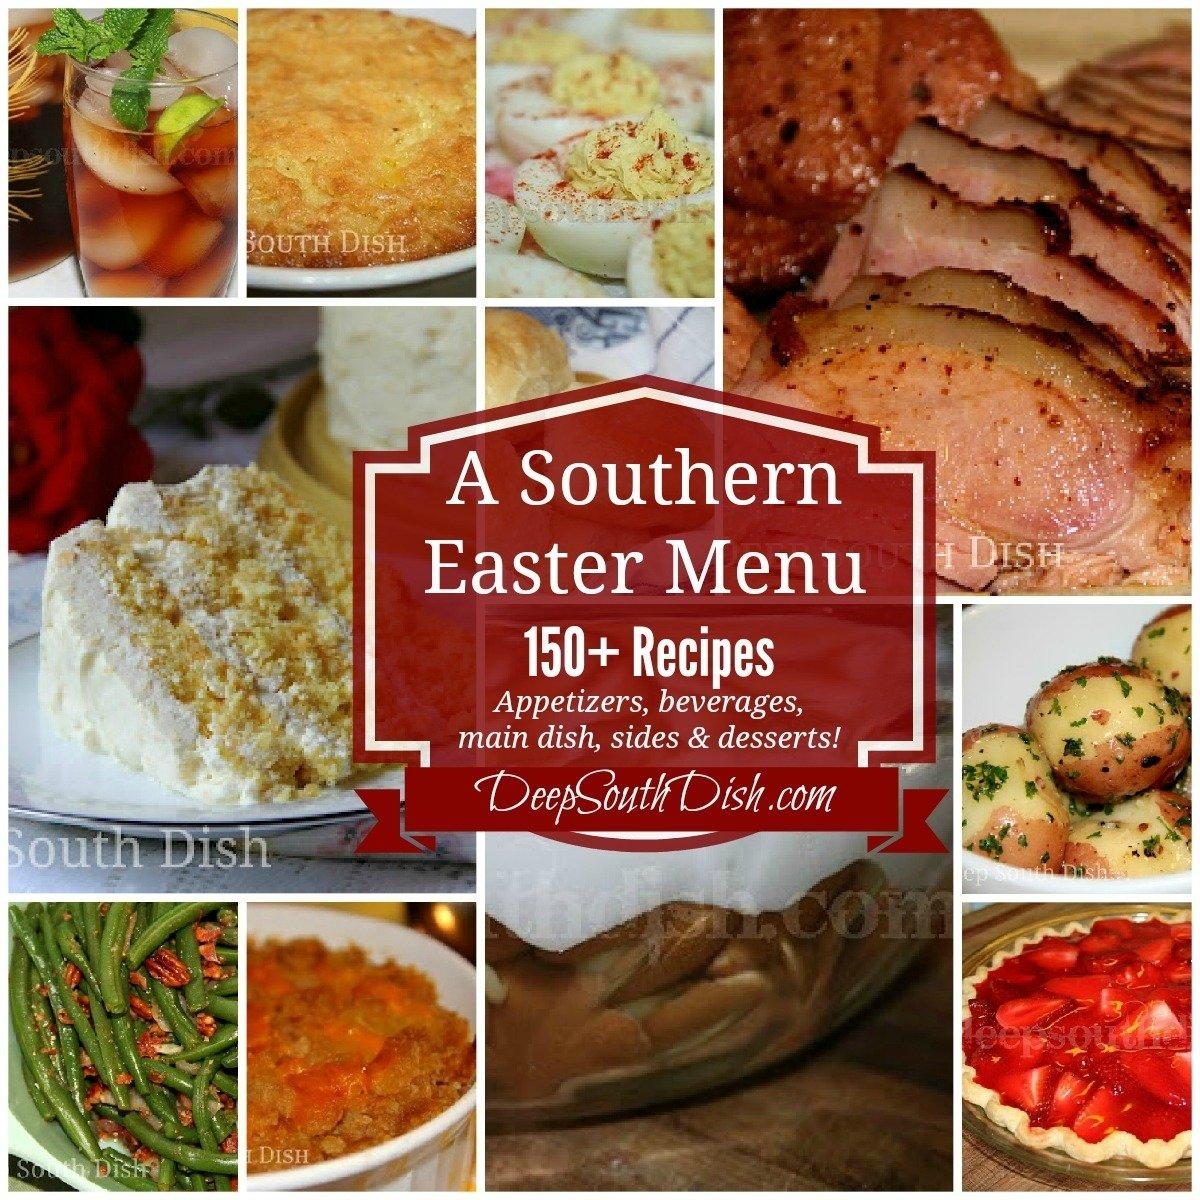 10 Awesome Christmas Ham Dinner Menu Ideas deep south dish southern easter menu ideas and recipes 11 2021